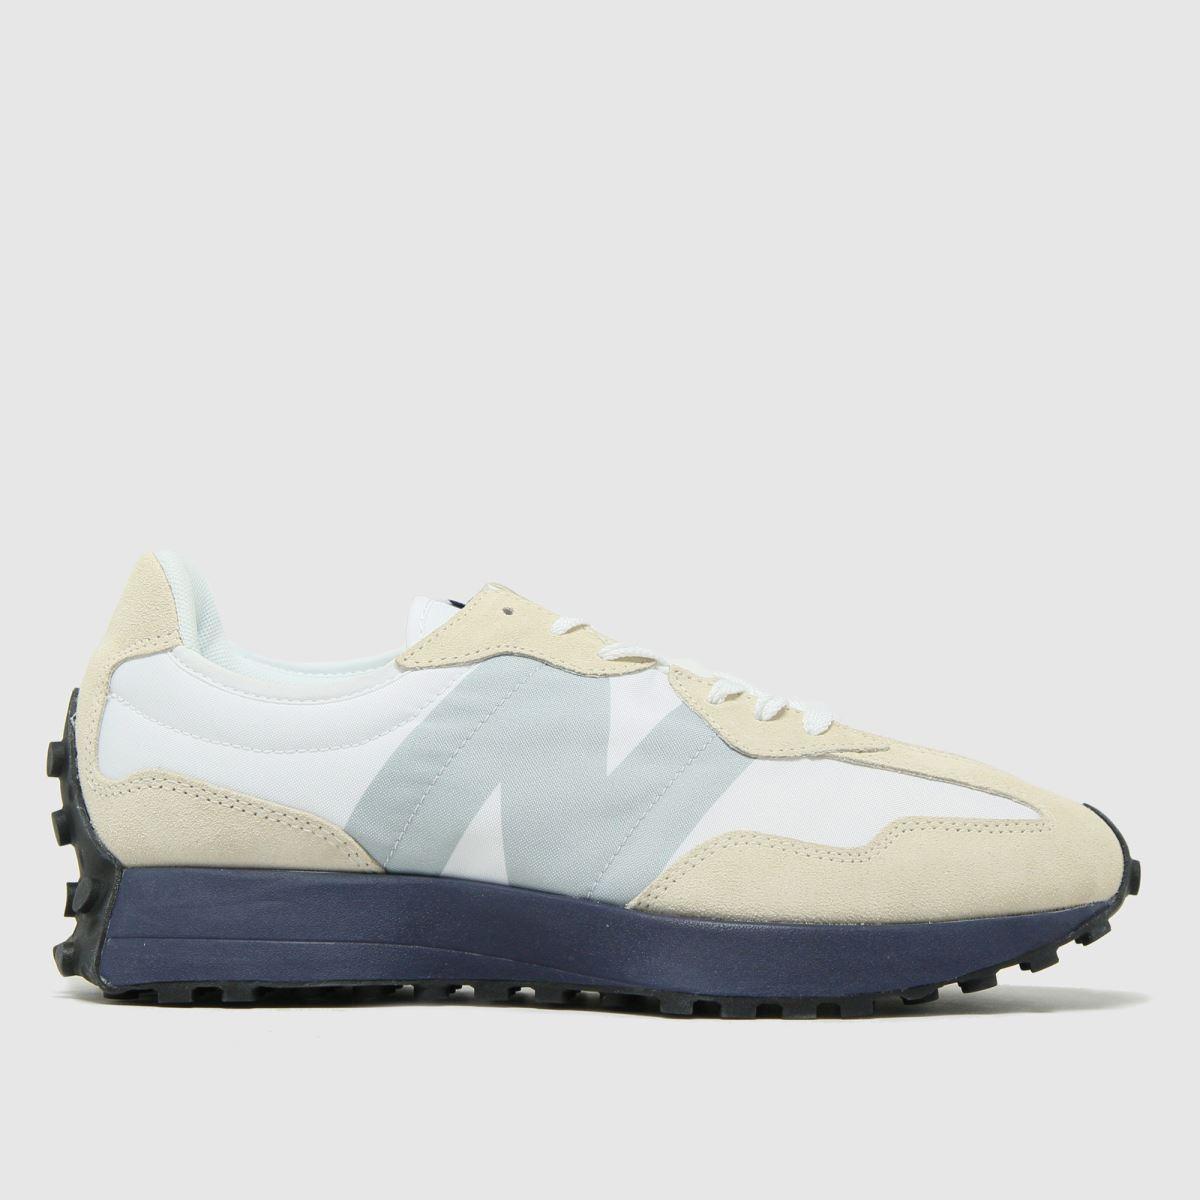 New Balance White & Navy Nb 327 Trainers